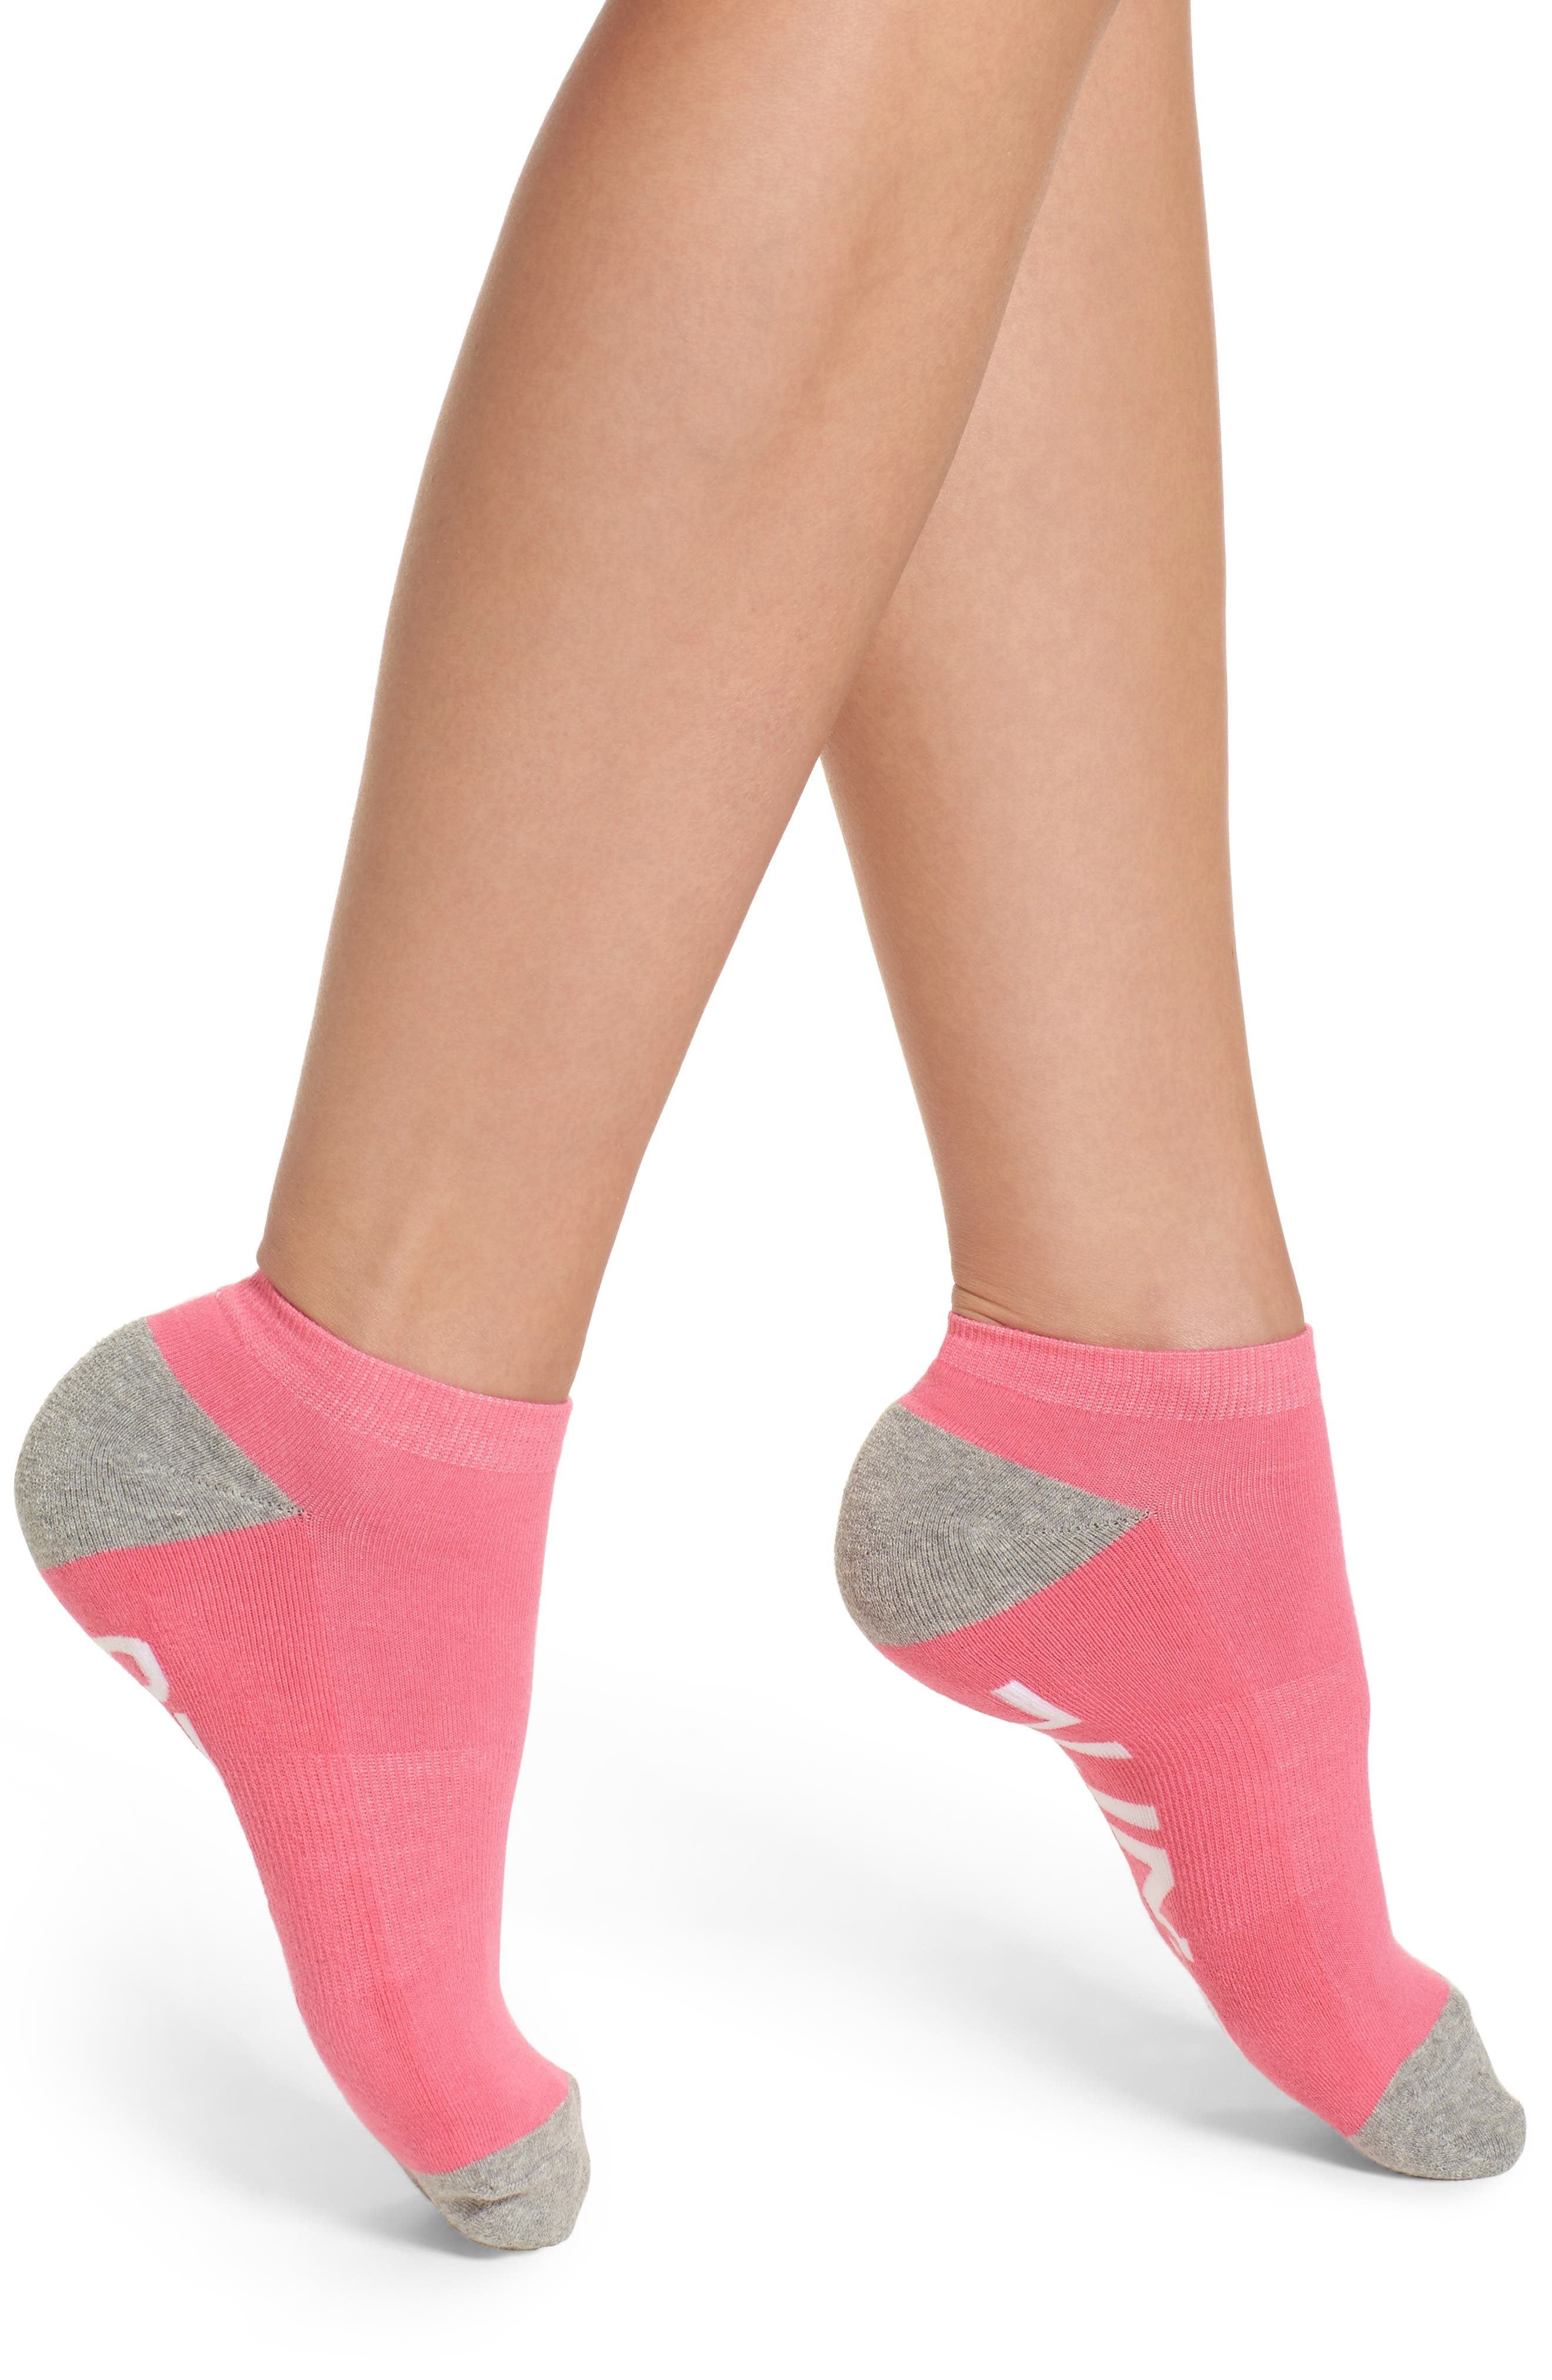 Babes Unite Ankle Socks,                         Main,                         color,